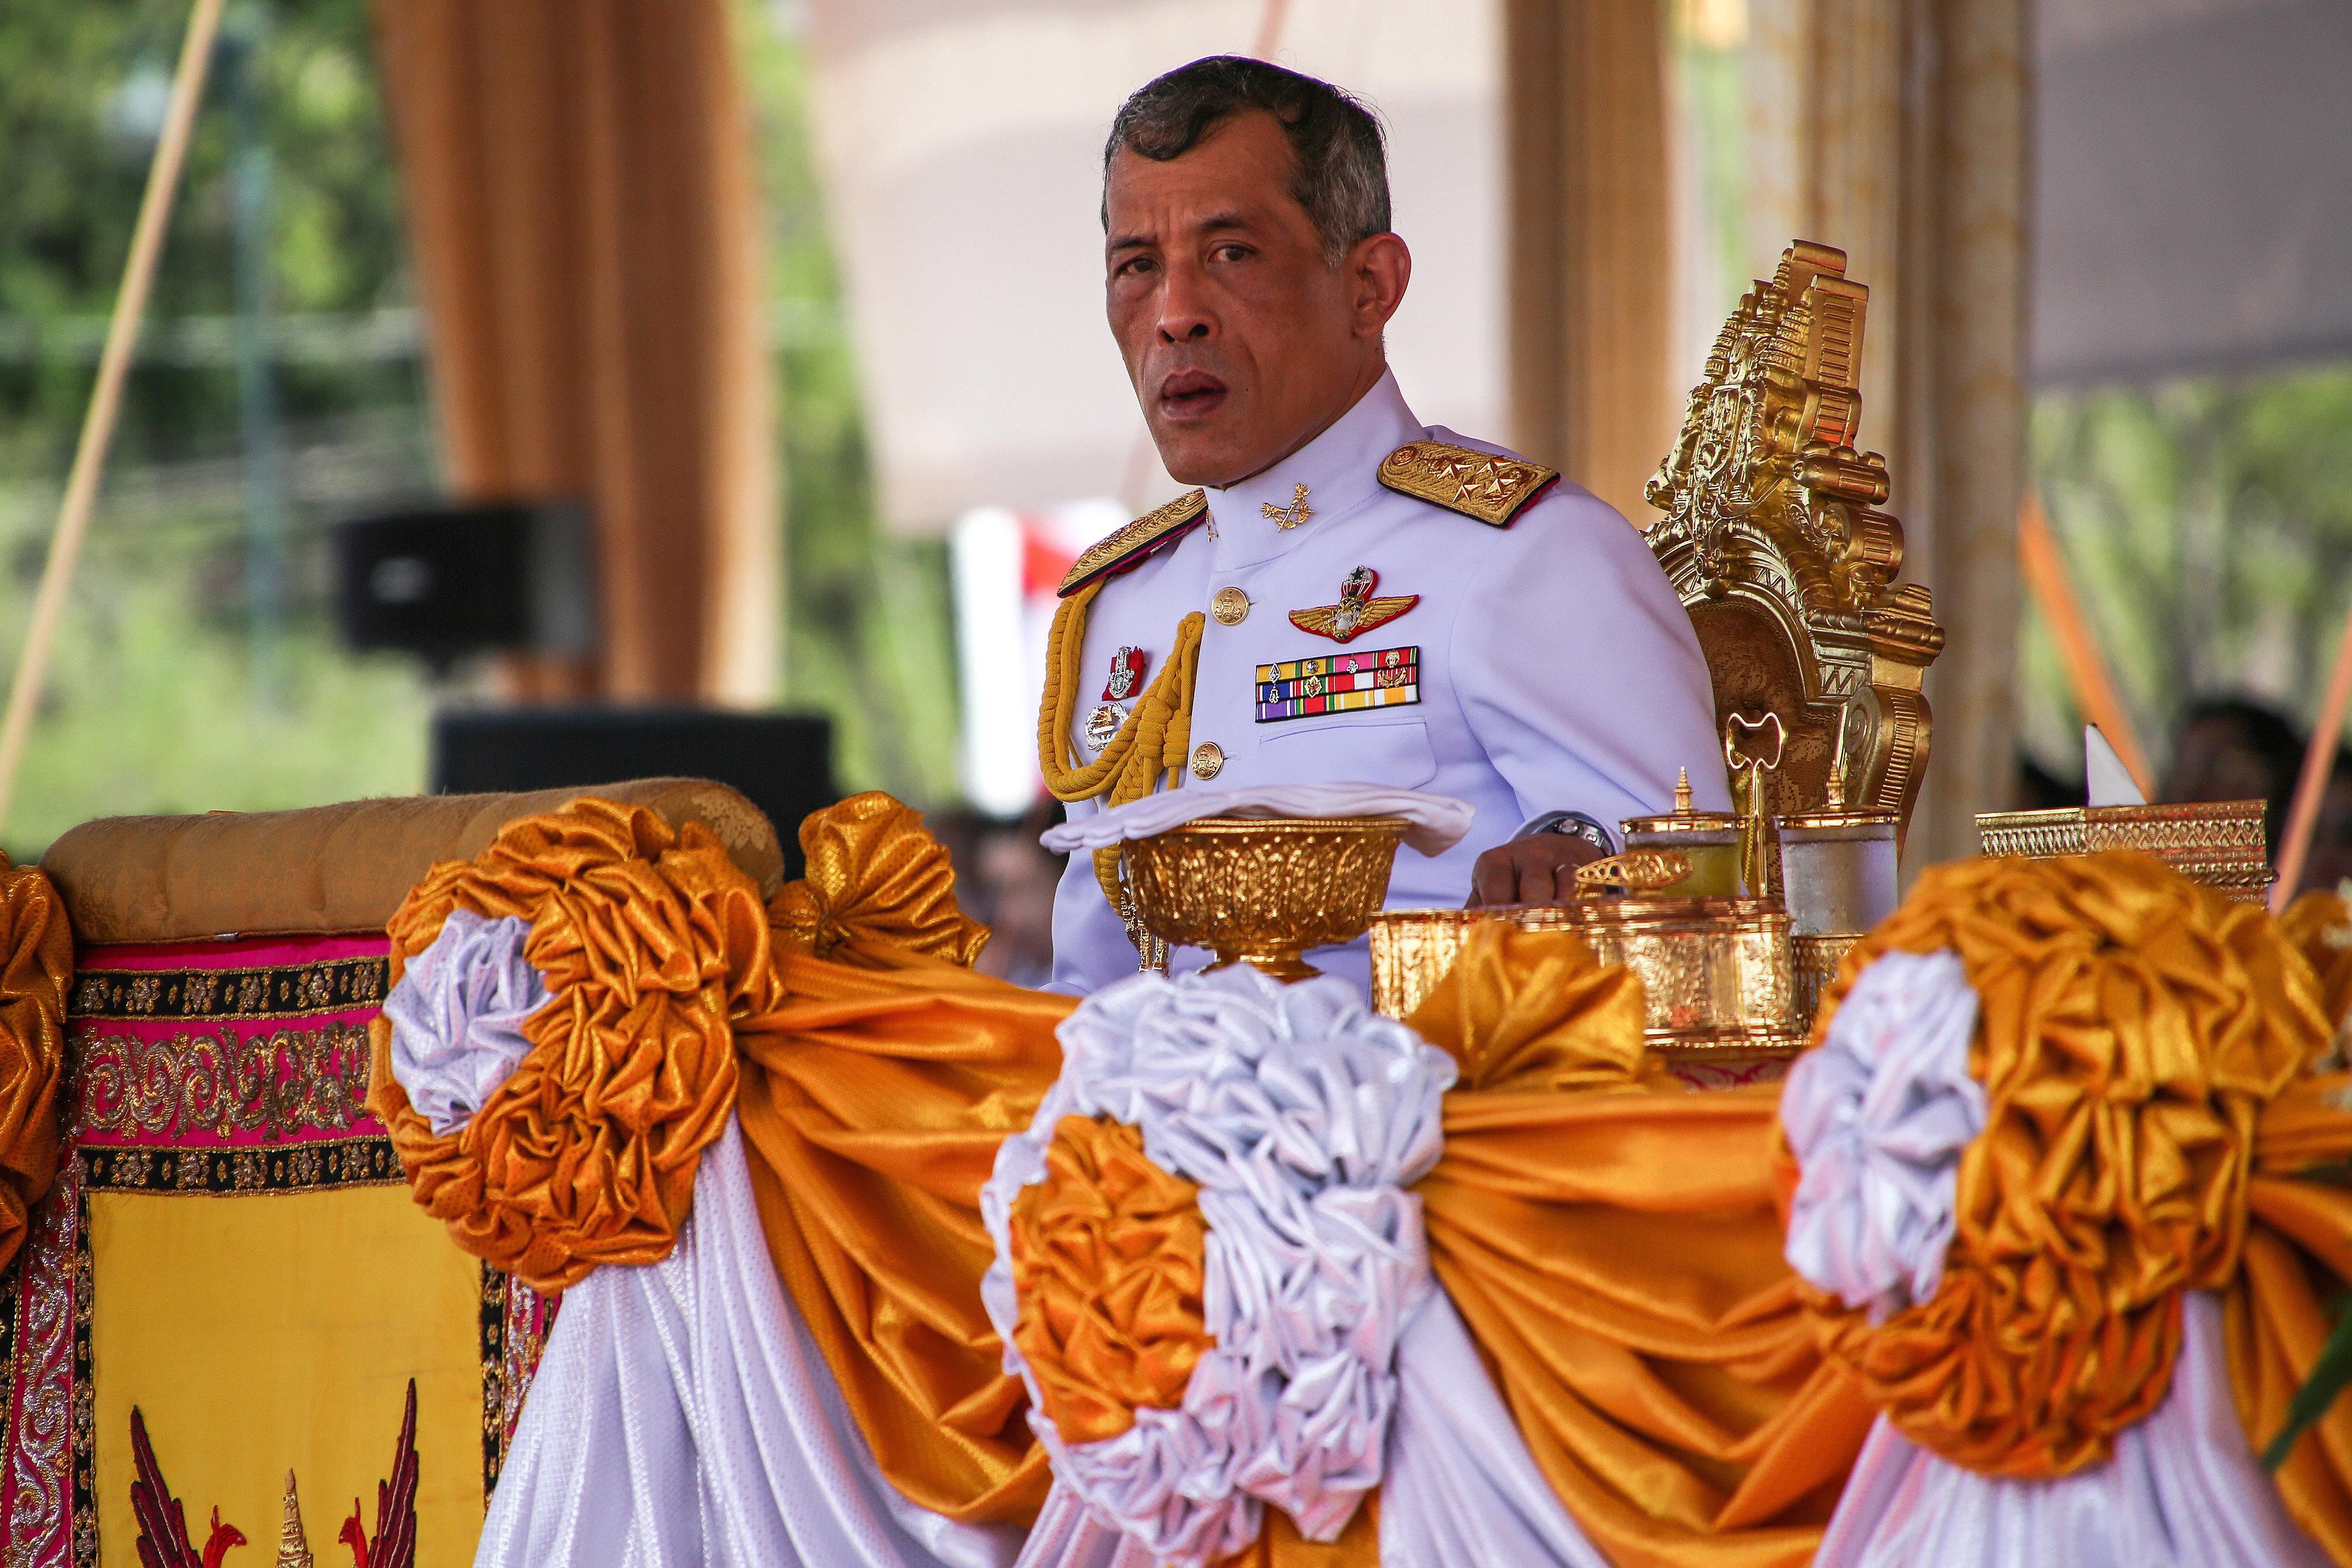 Crown Prince Maha Vajiralongkorn of Thailand attends a ceremony in Bangkok on May 9, 2016